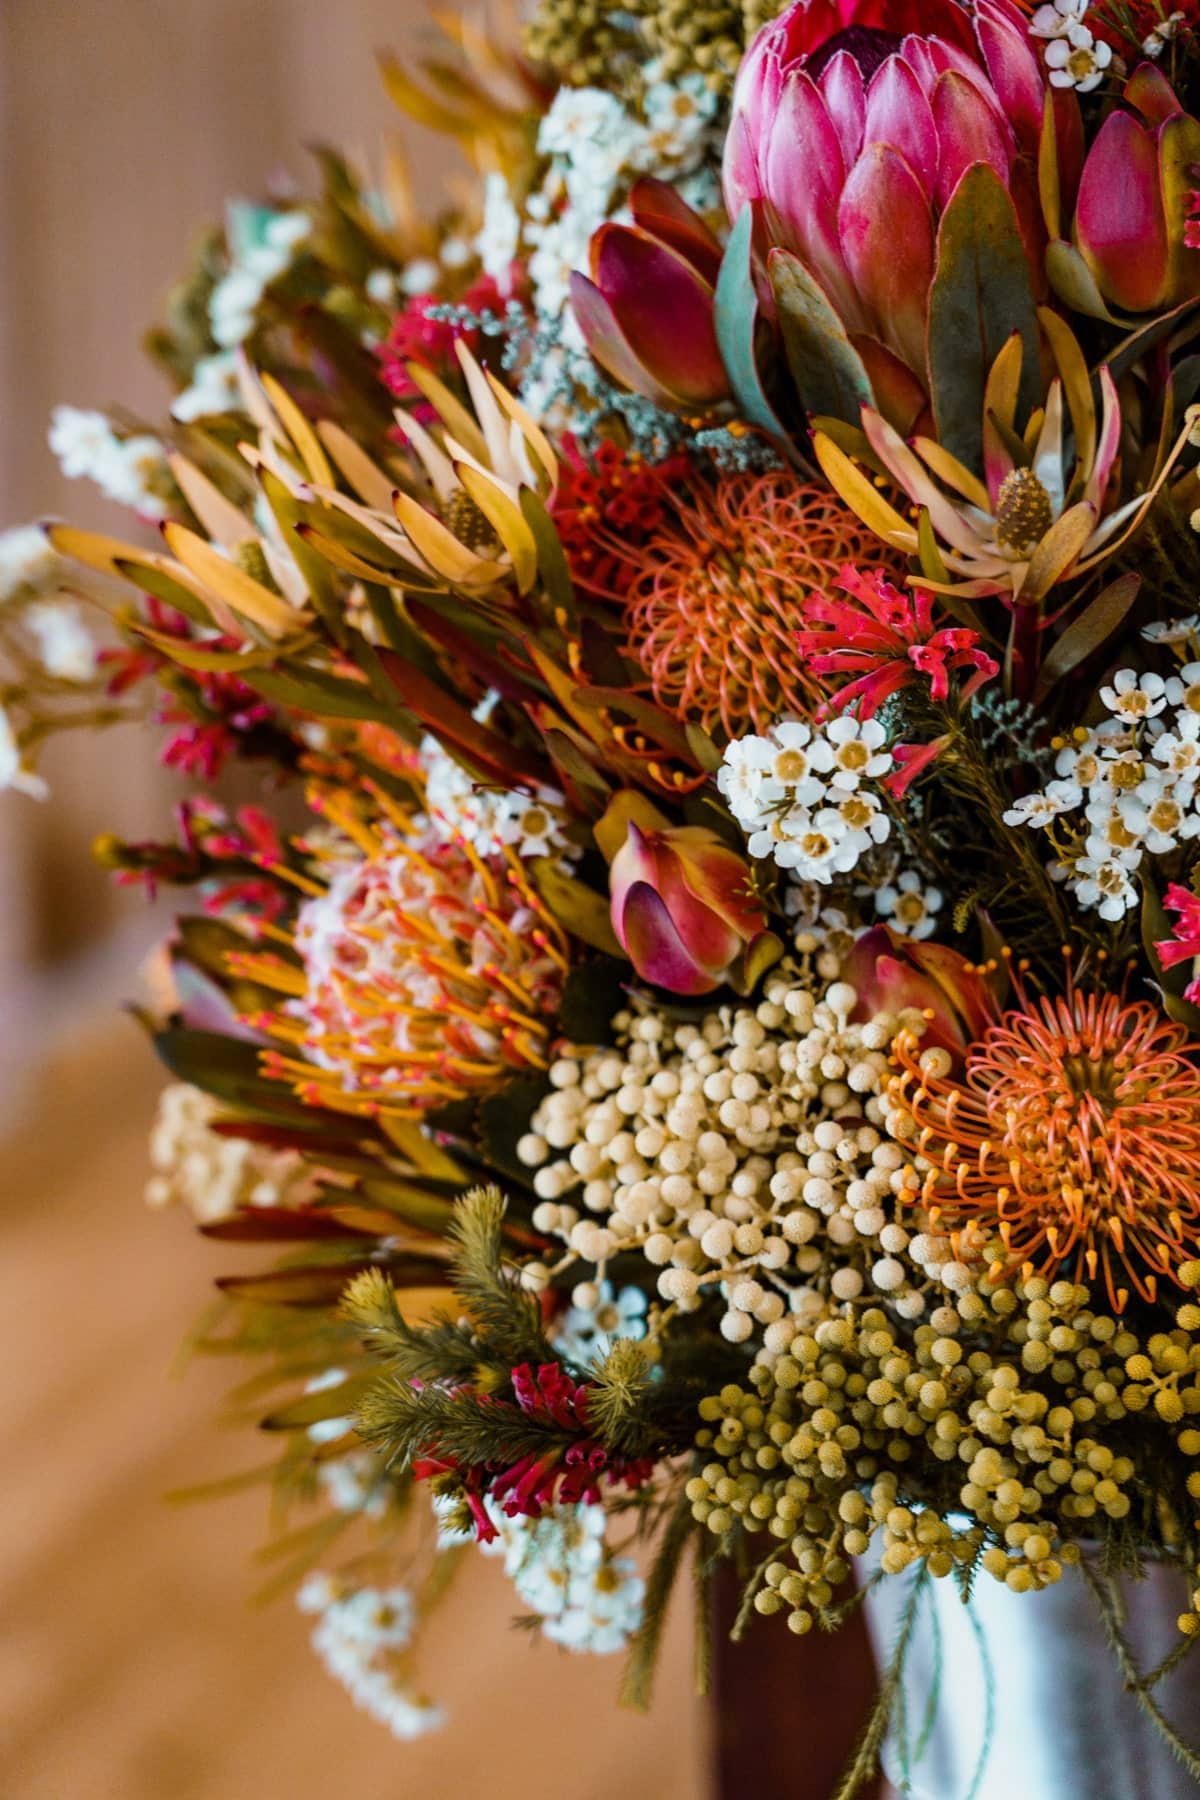 Südafrika Garden Route Route für euren Roadtrip: Pflanzensafari in Grootbos